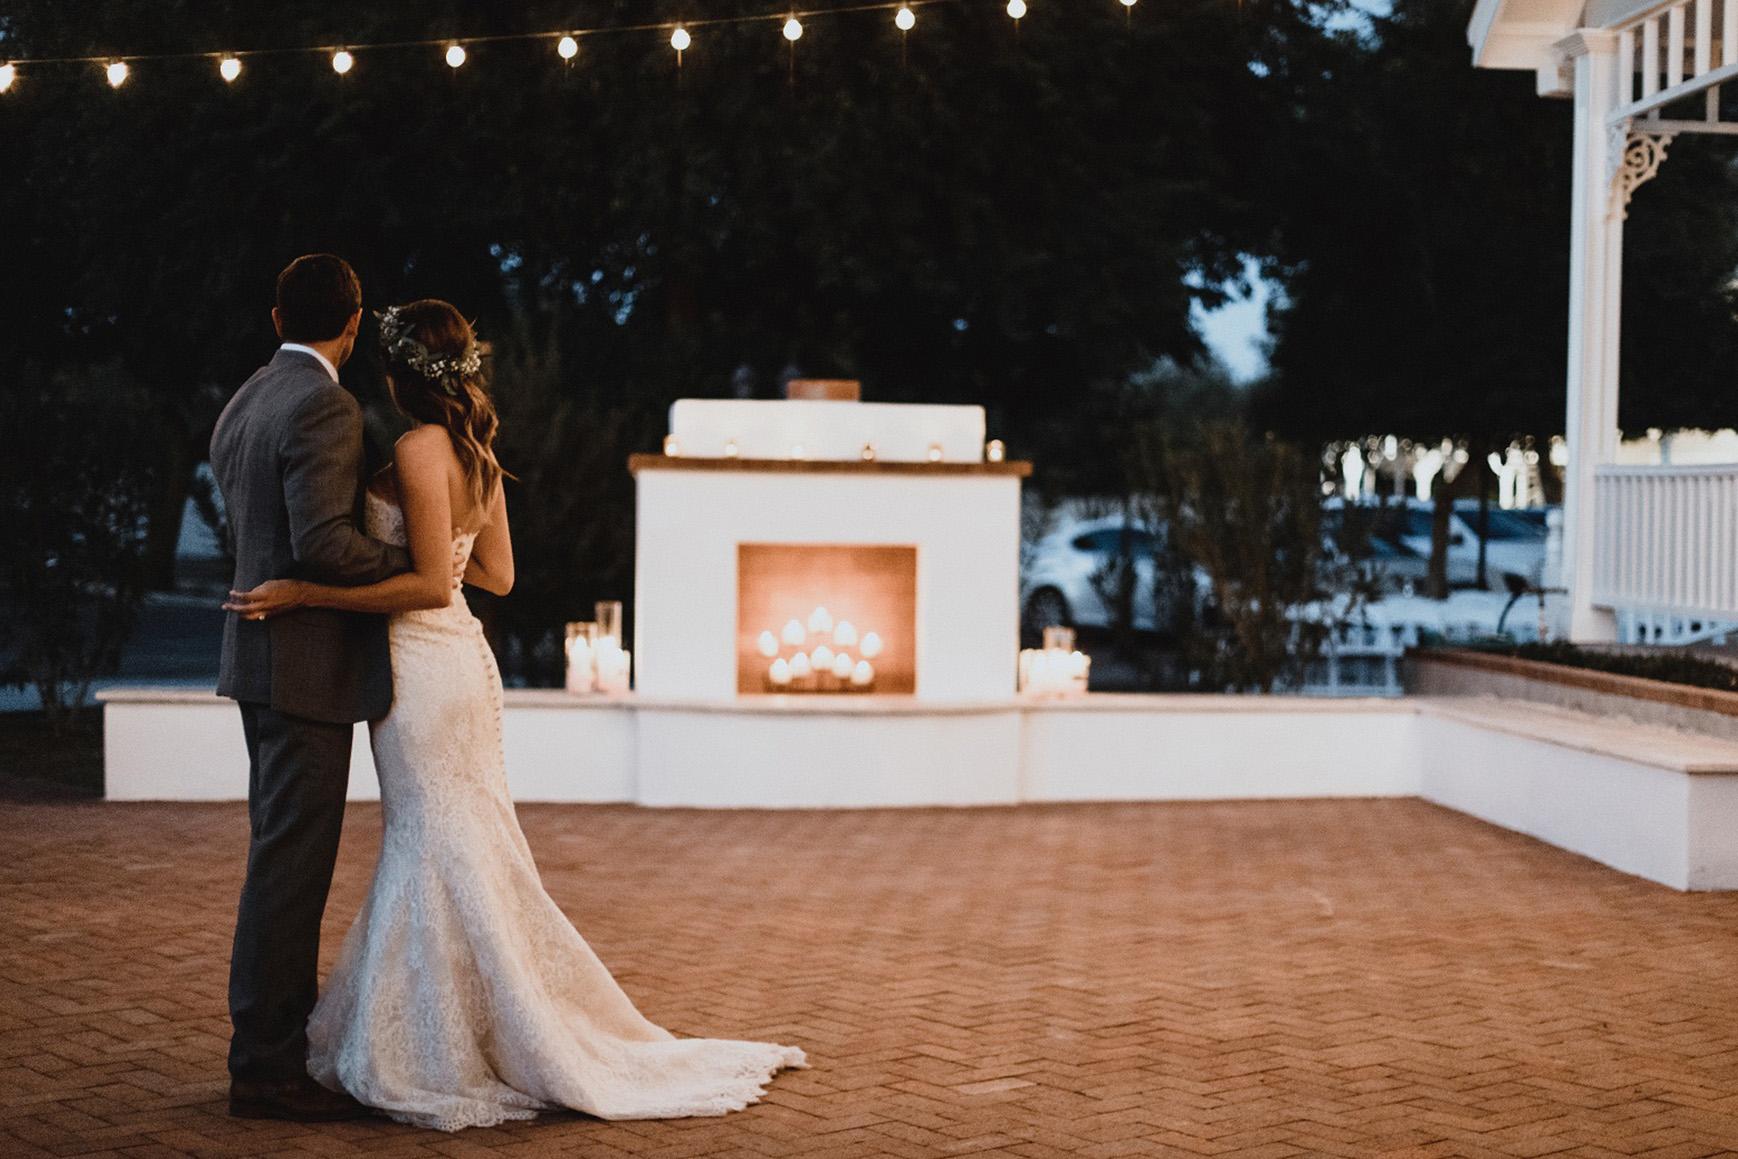 Cocktails by the fire - Lindsay Grove - Mesa, Arizona - Maricopa County - Wedgewood Weddings